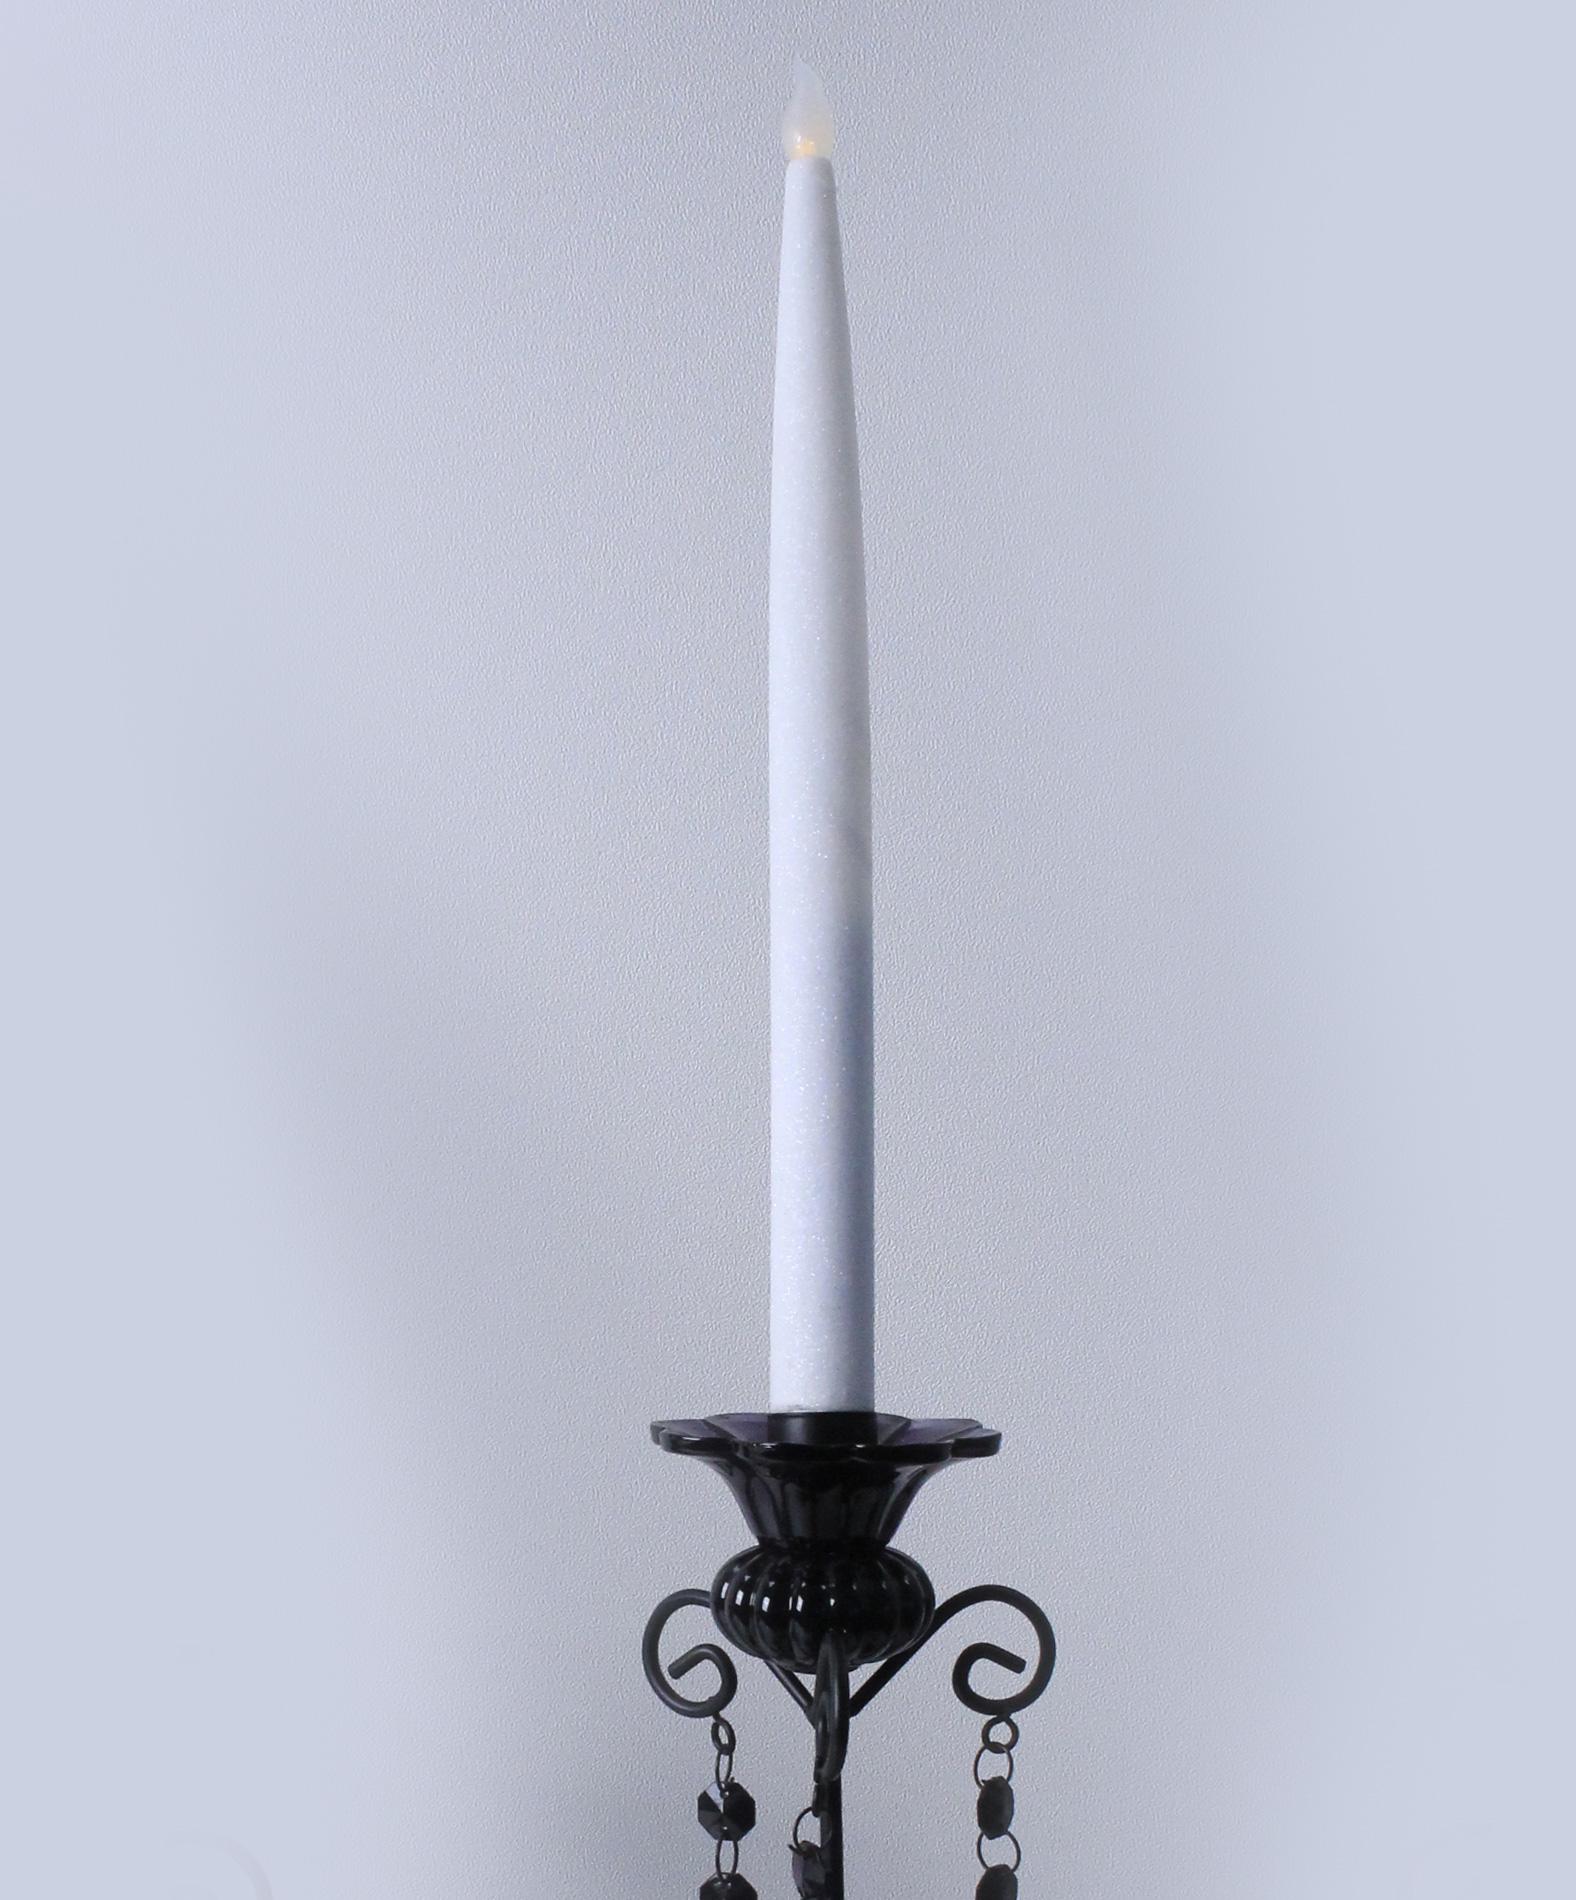 2 bougies chandelles led blanches d coration anniversaire et f tes th me sur vegaoo party. Black Bedroom Furniture Sets. Home Design Ideas